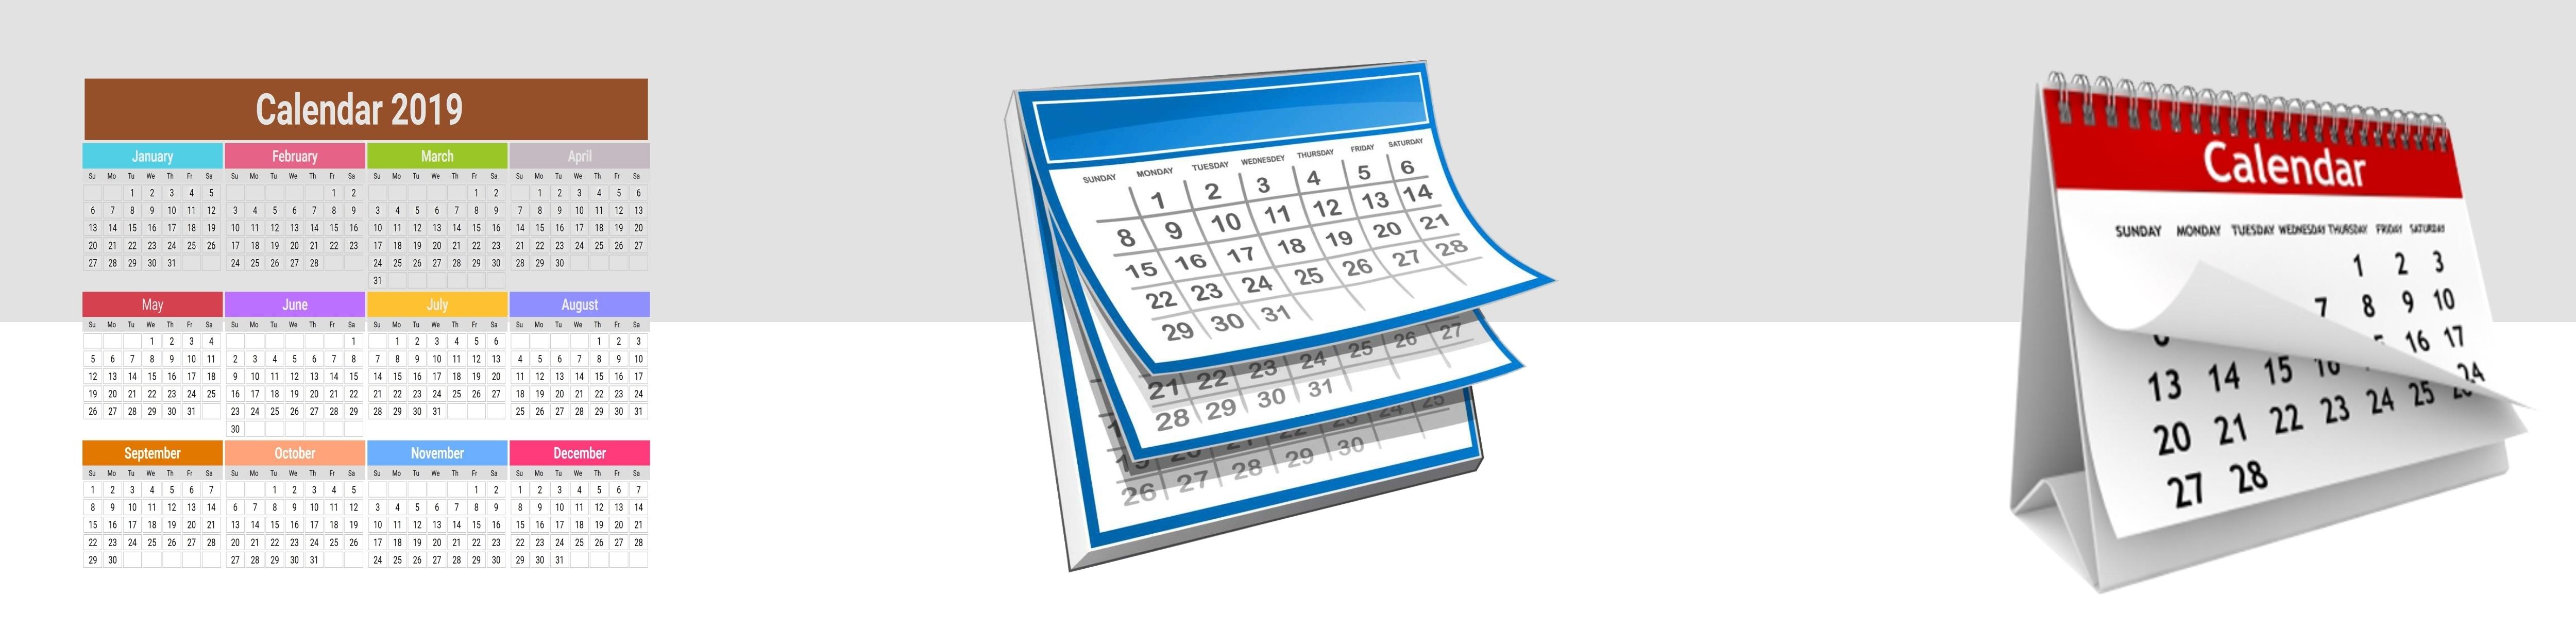 Calendars Printing In Chittoor, Wall Calendars Printing In Chittoor The Calendar Printing Company